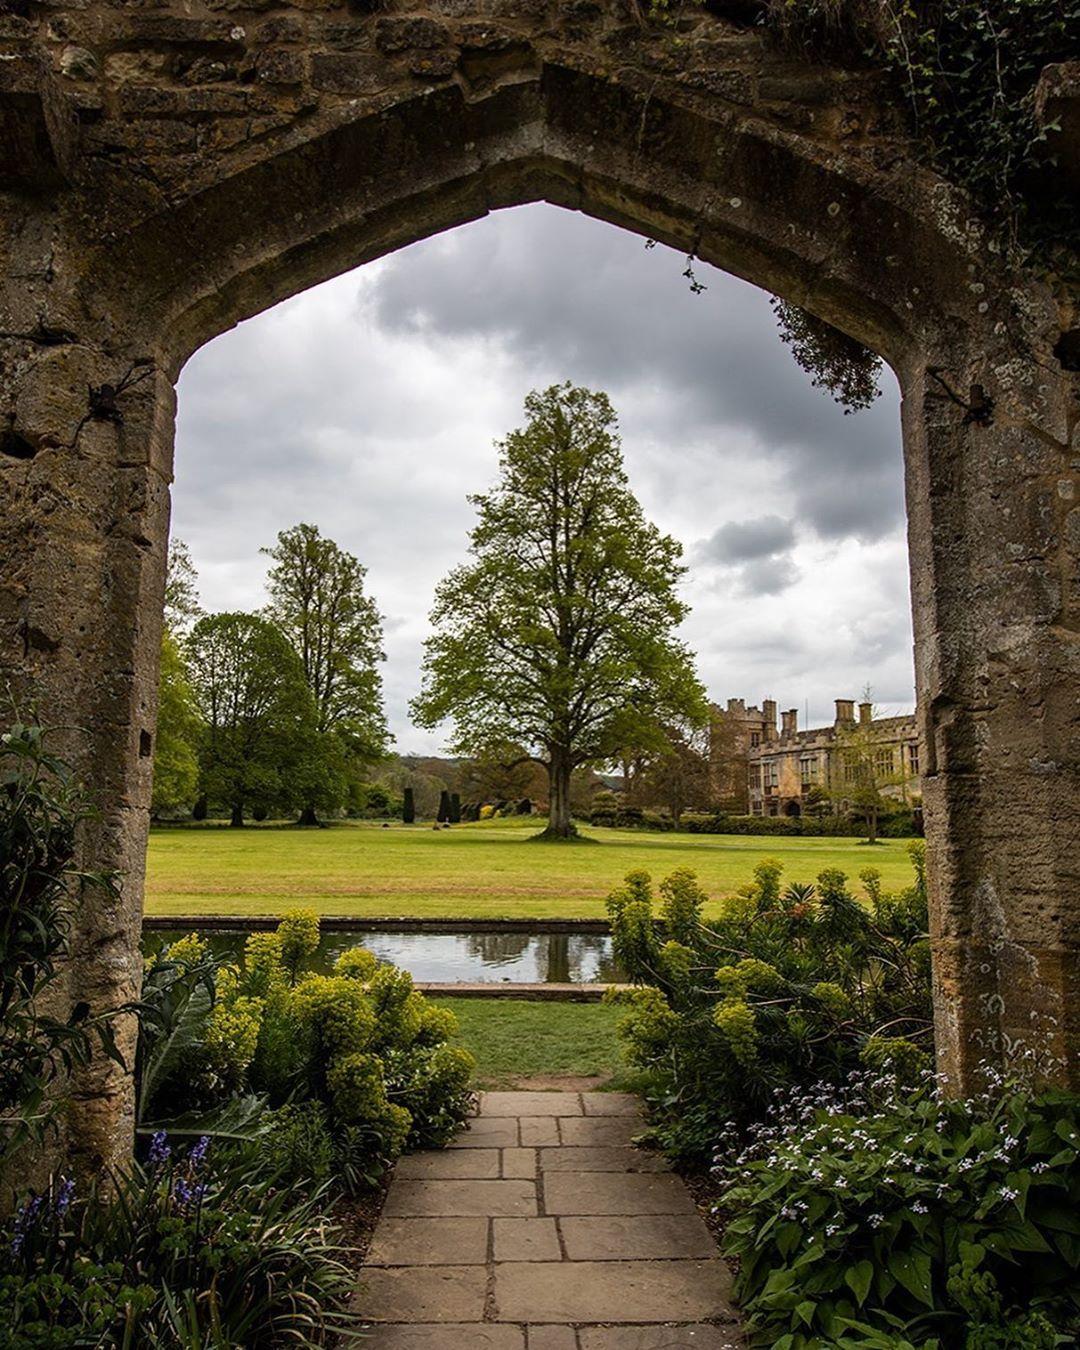 Sudeley Castle Gardens Winchcombe Gloucestershire Gb Curvilinear Boxwood Knot Garden Tuin Tuinieren Planten